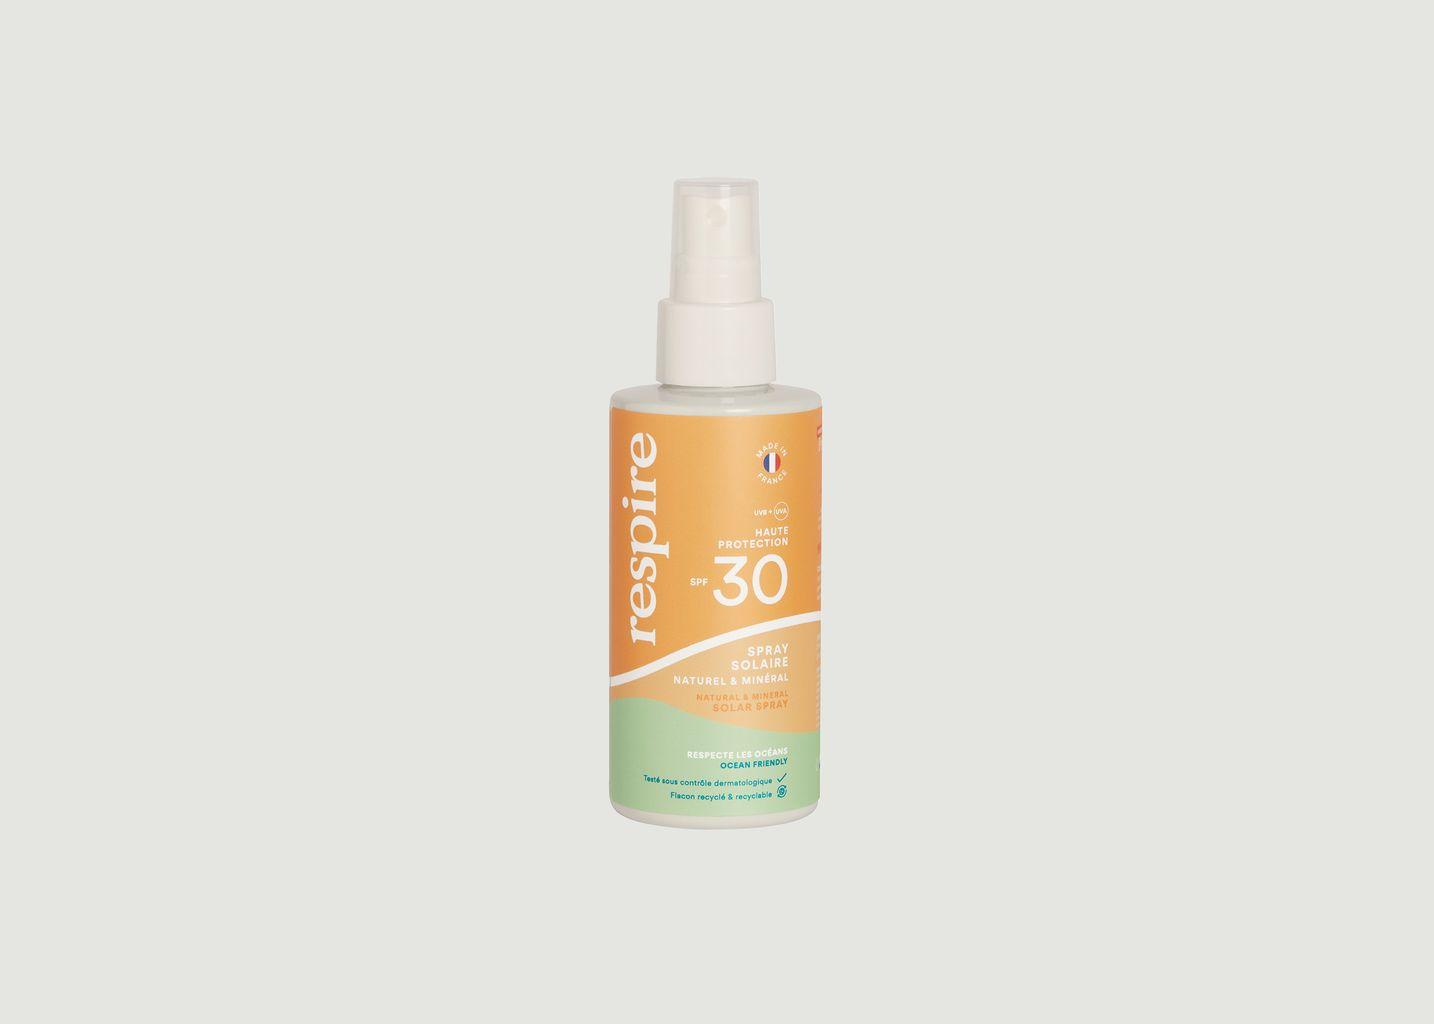 Spray Solaire SPF 30 120mL - Respire